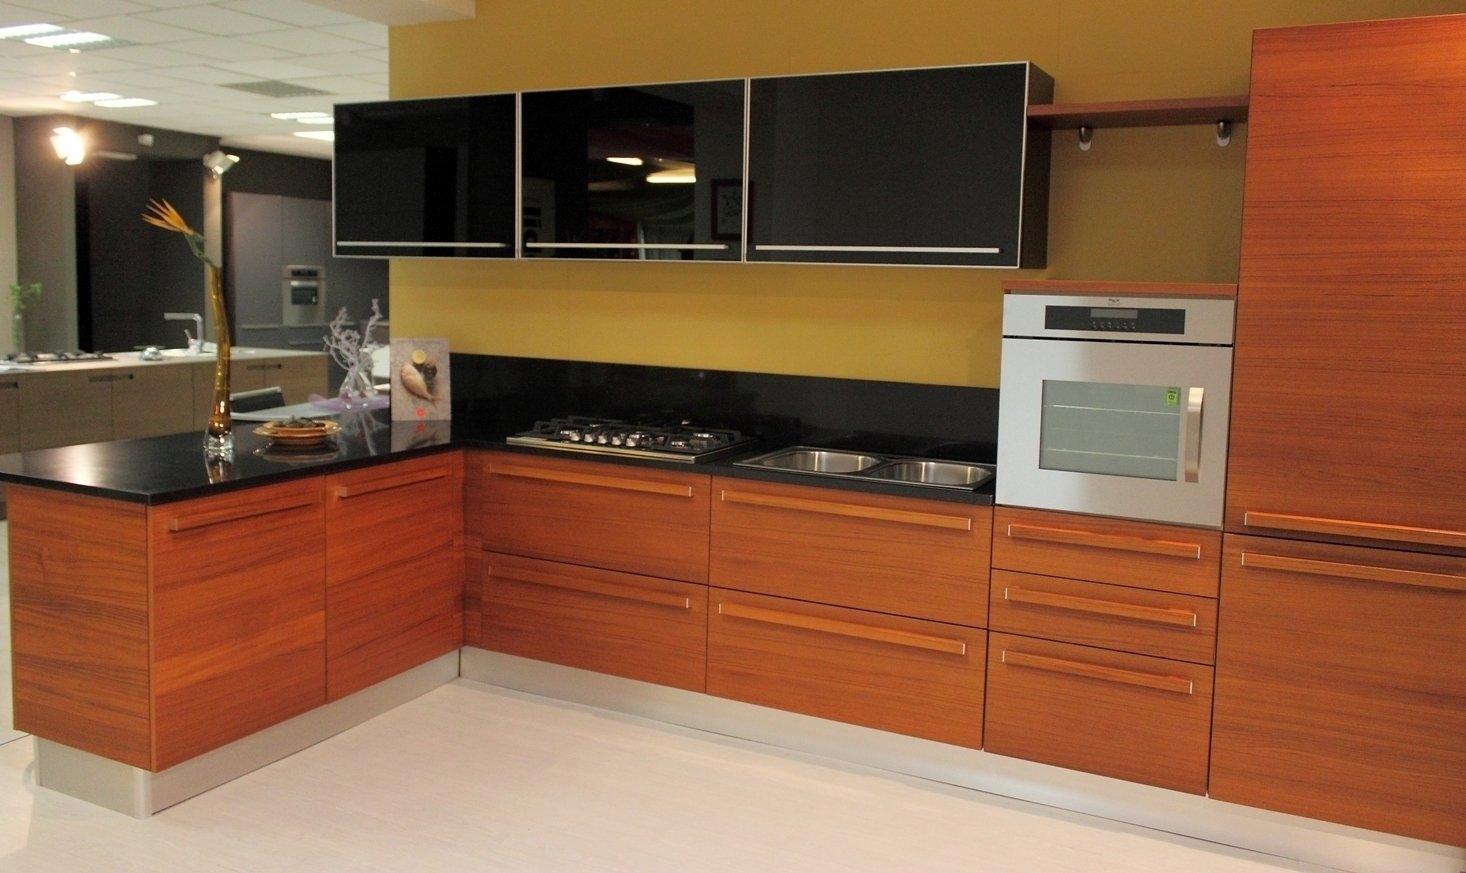 Cucina arrital doimo offerta cucine a prezzi scontati - Cucine arrital prezzi ...